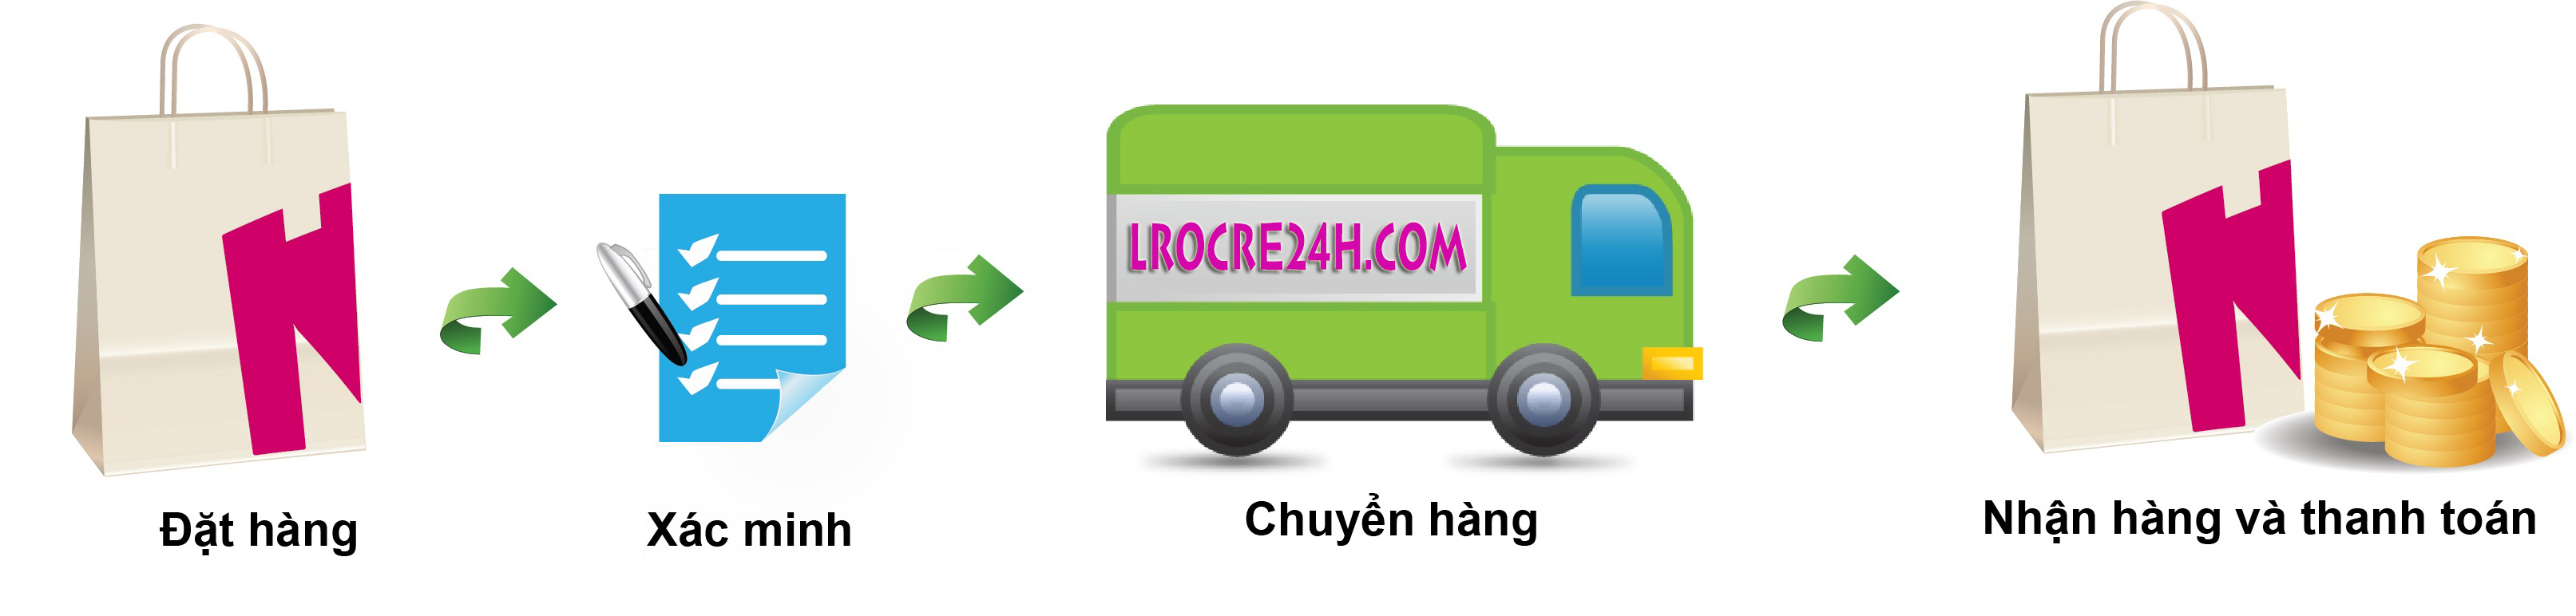 chuyen-phat-nhanh-cod-lrocre24h-com